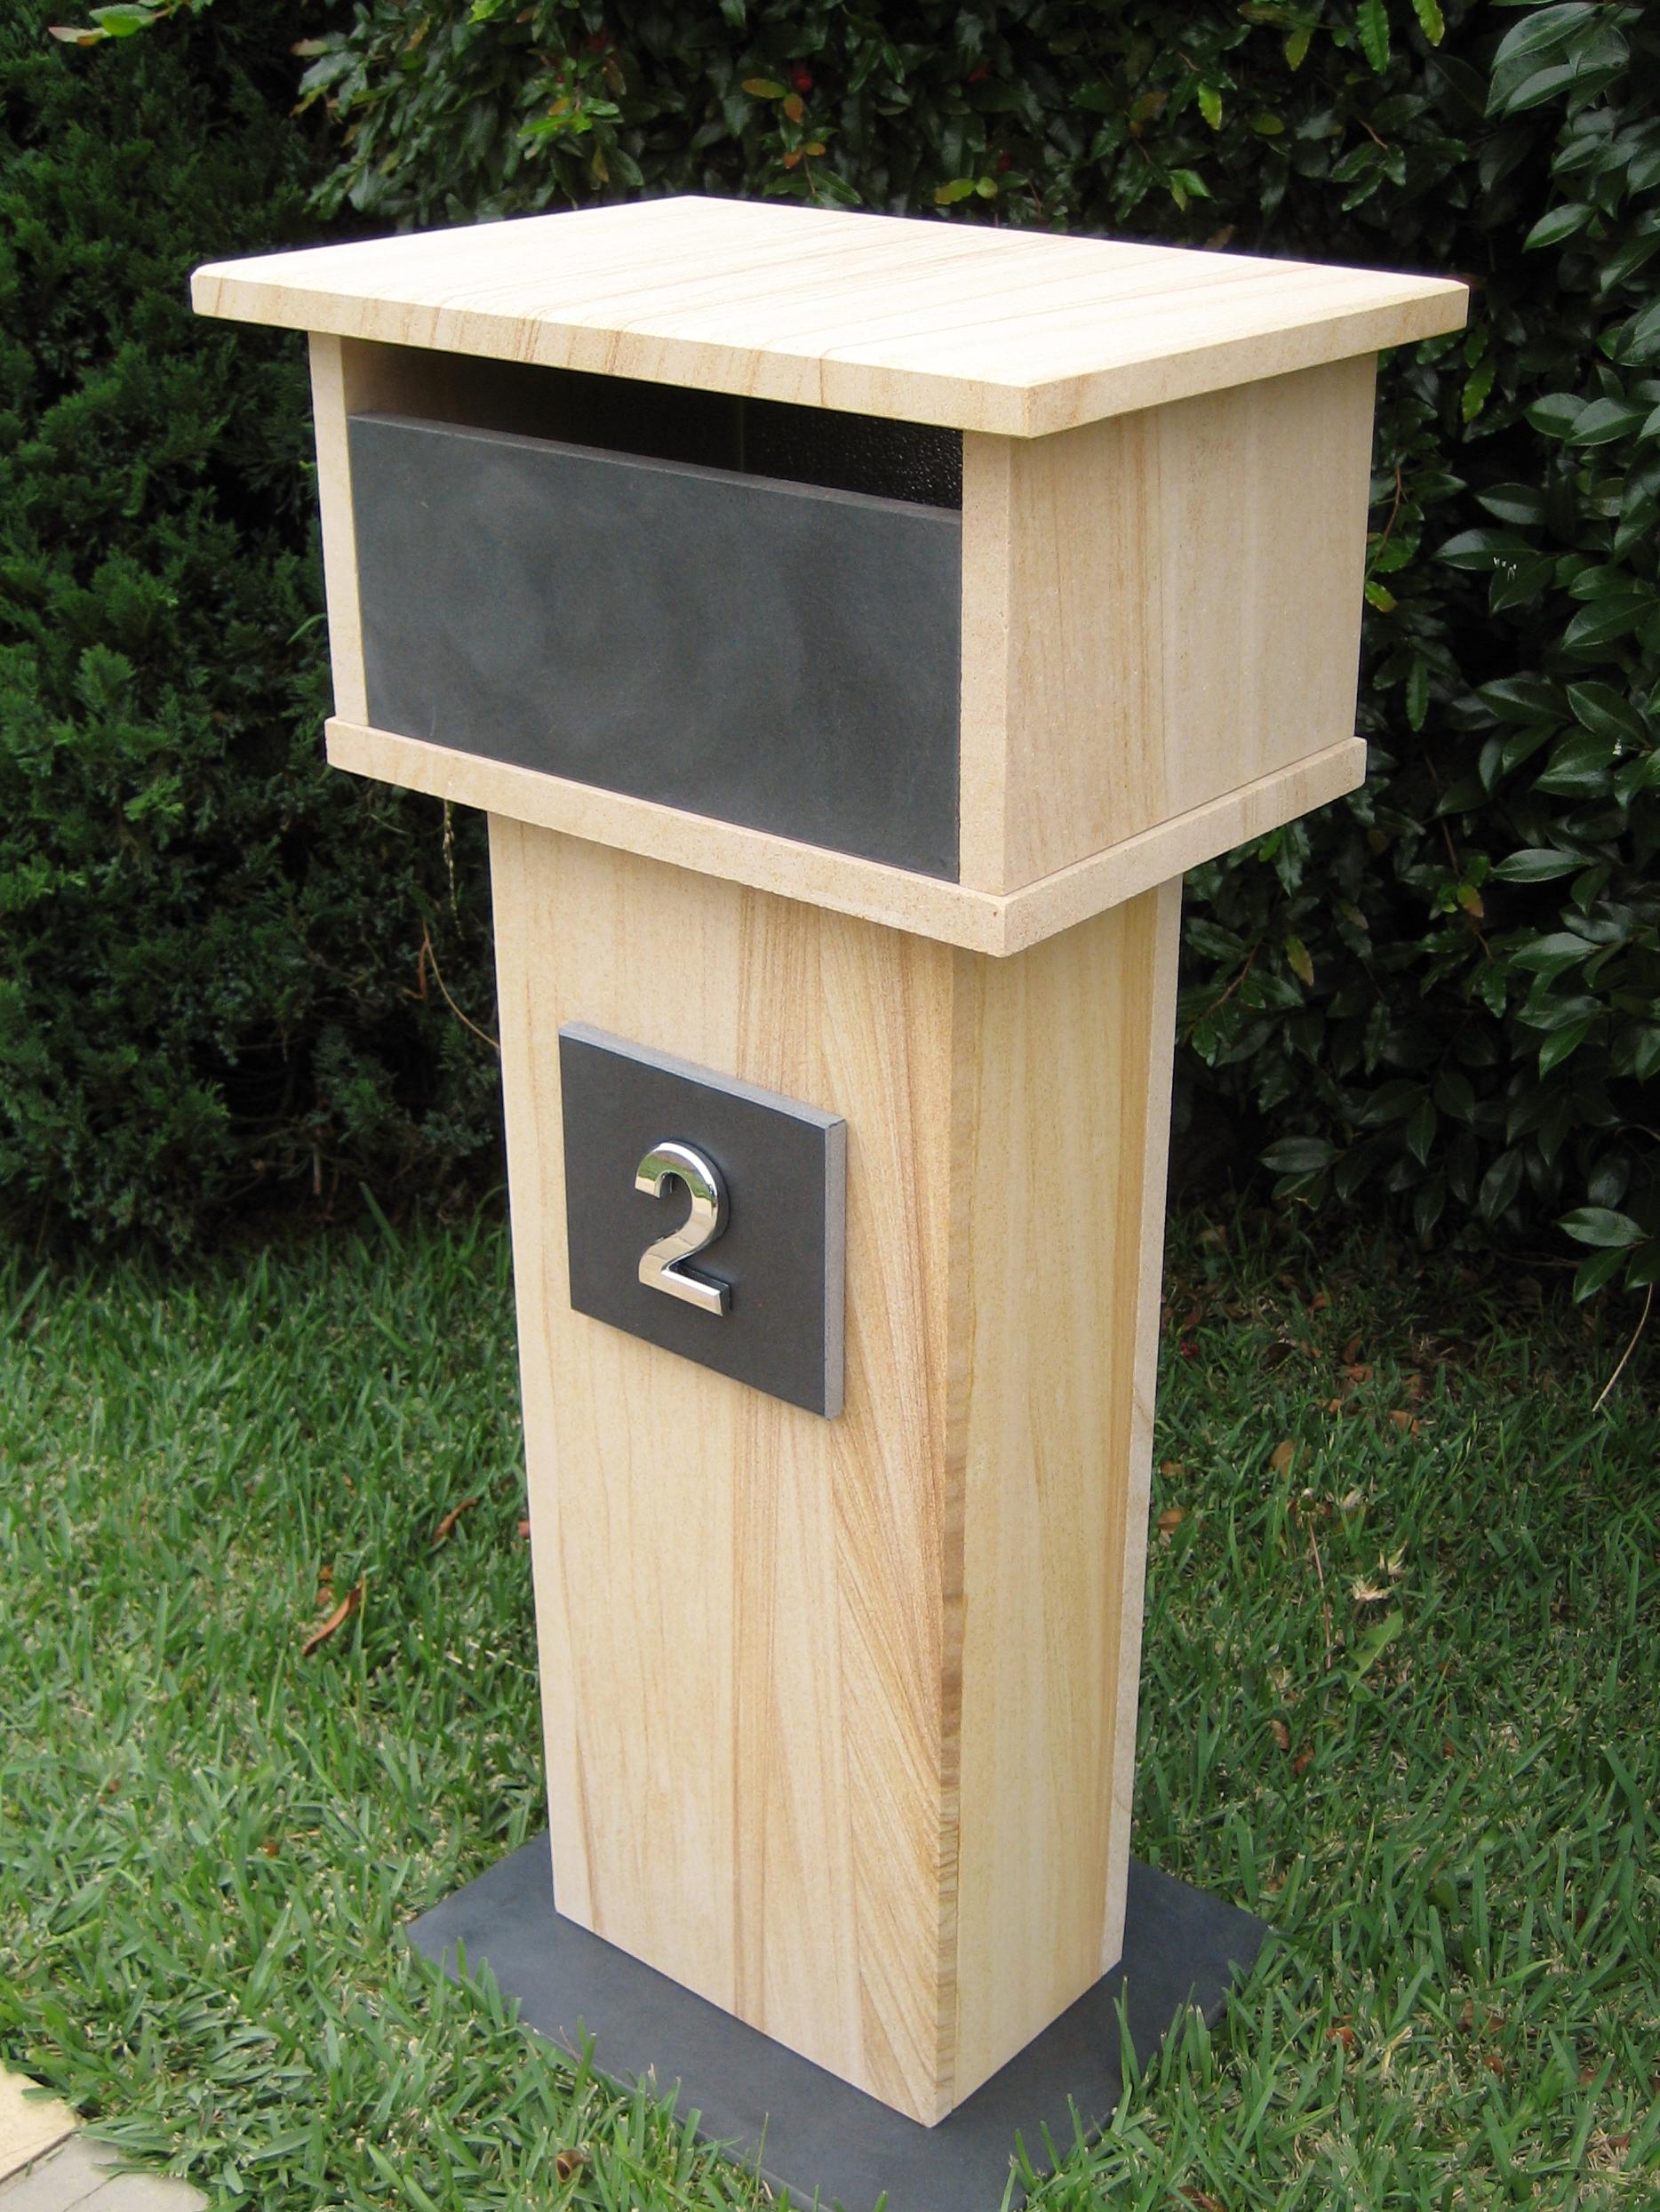 49. Sandstone, bluestone aluminium back door with 2 key lock 820x400x290 $580